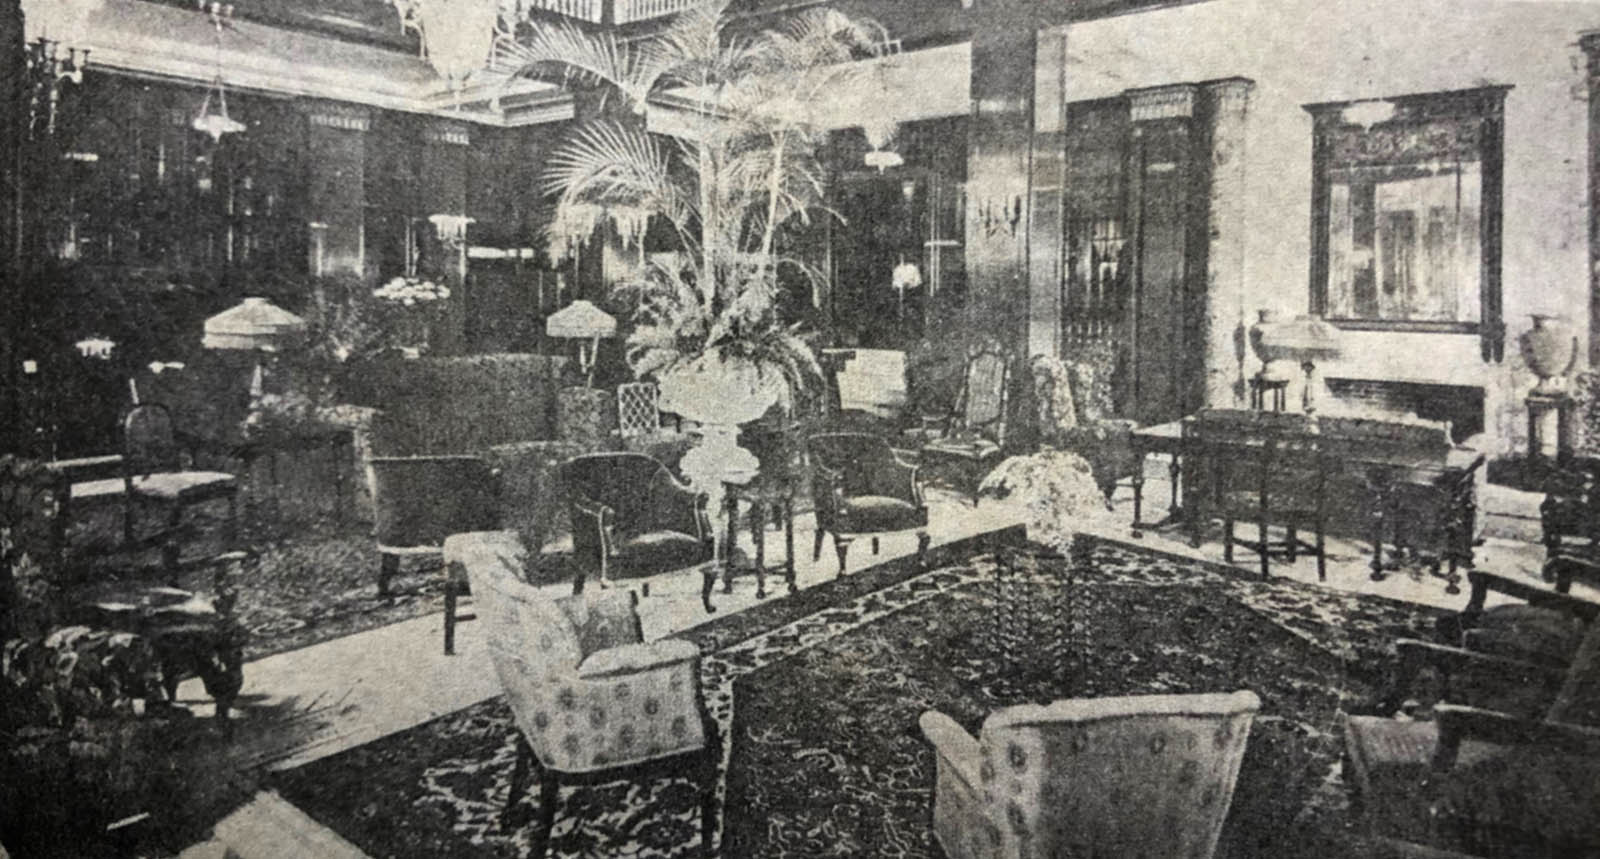 Vintage lobby view